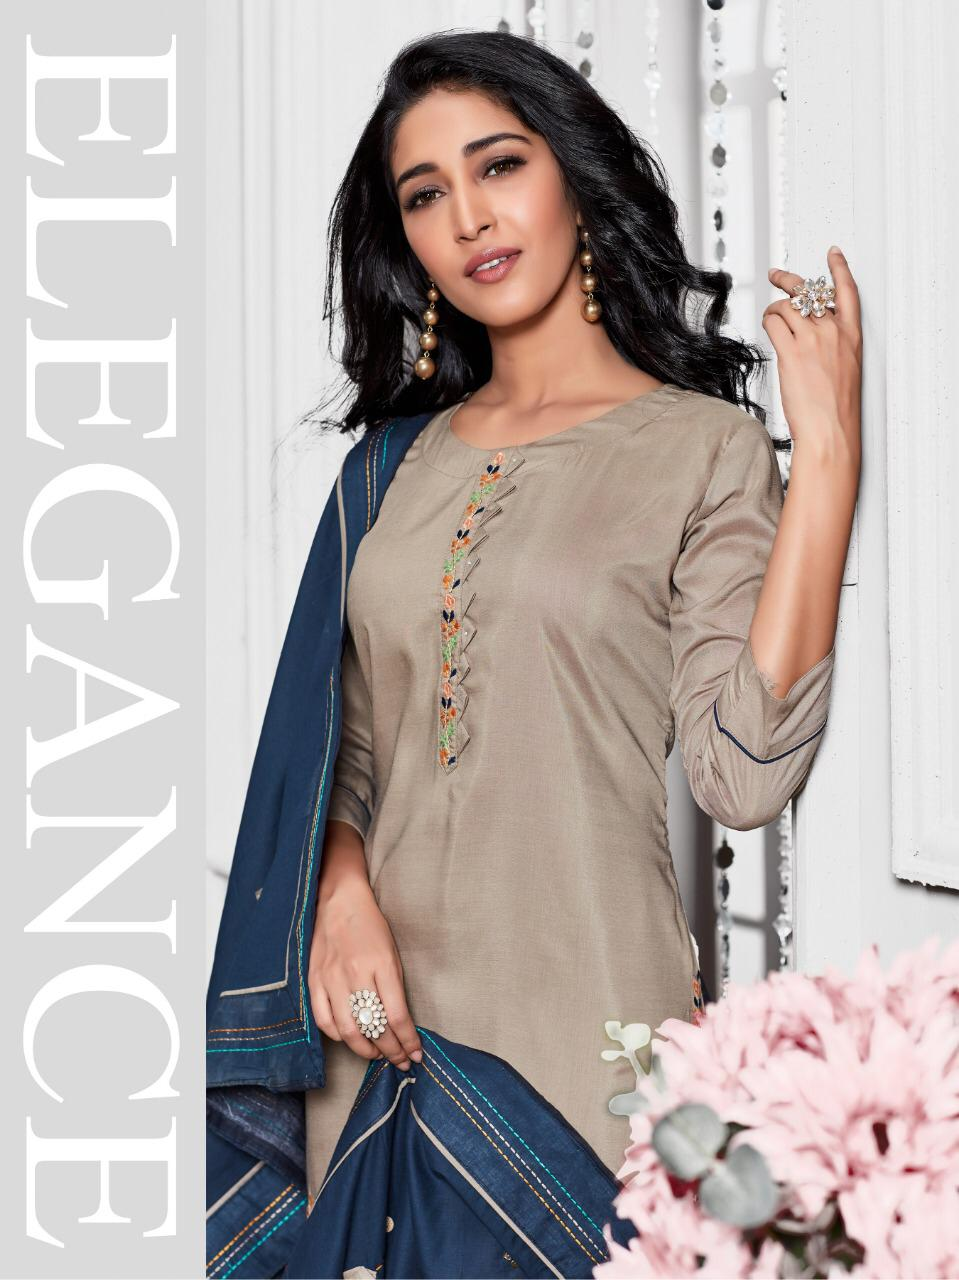 Kiana Crystal Vol 2 Designer Chanderi Silk Heavy Party Wear Fashionable Readymade Suits Wholesale